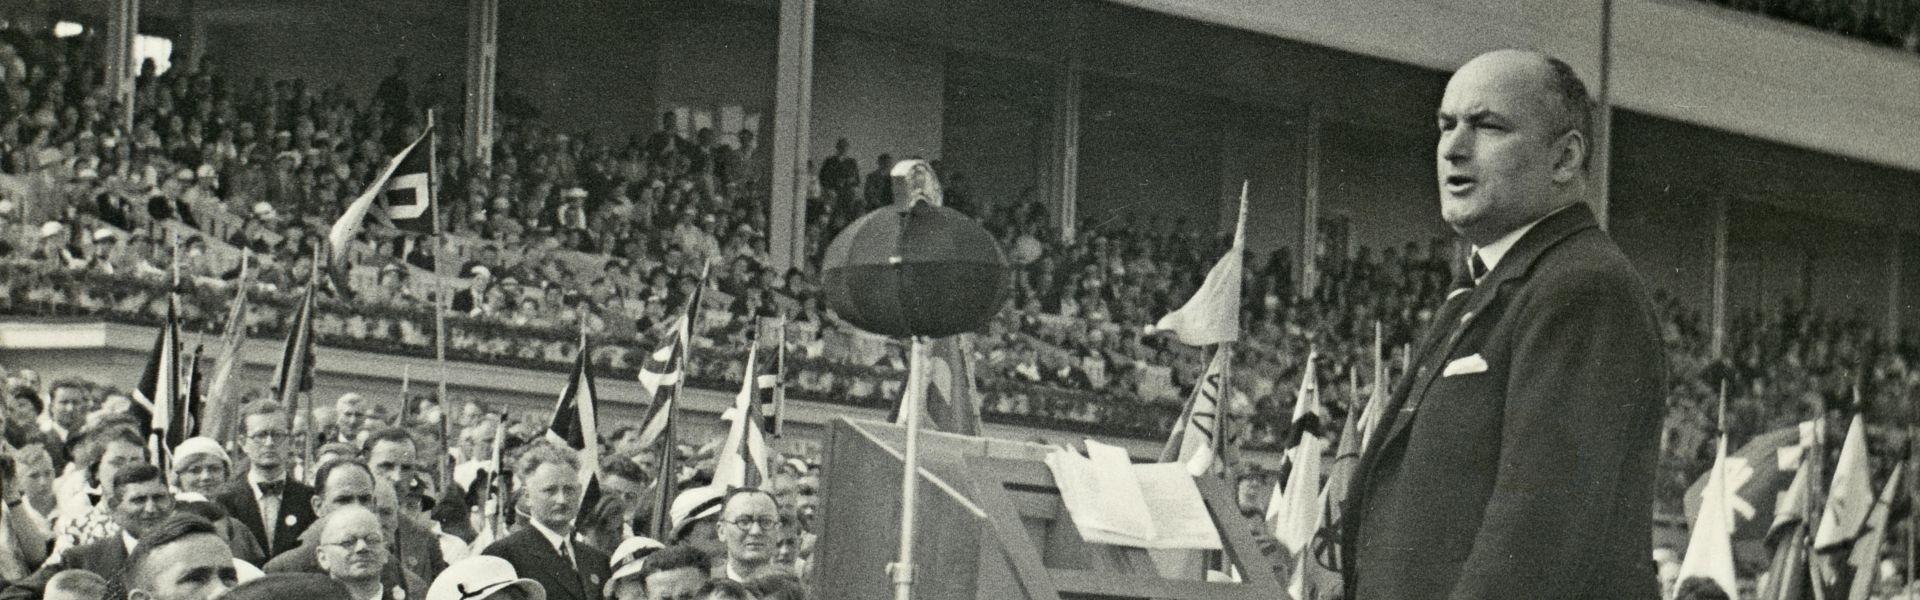 24. Juni 1934